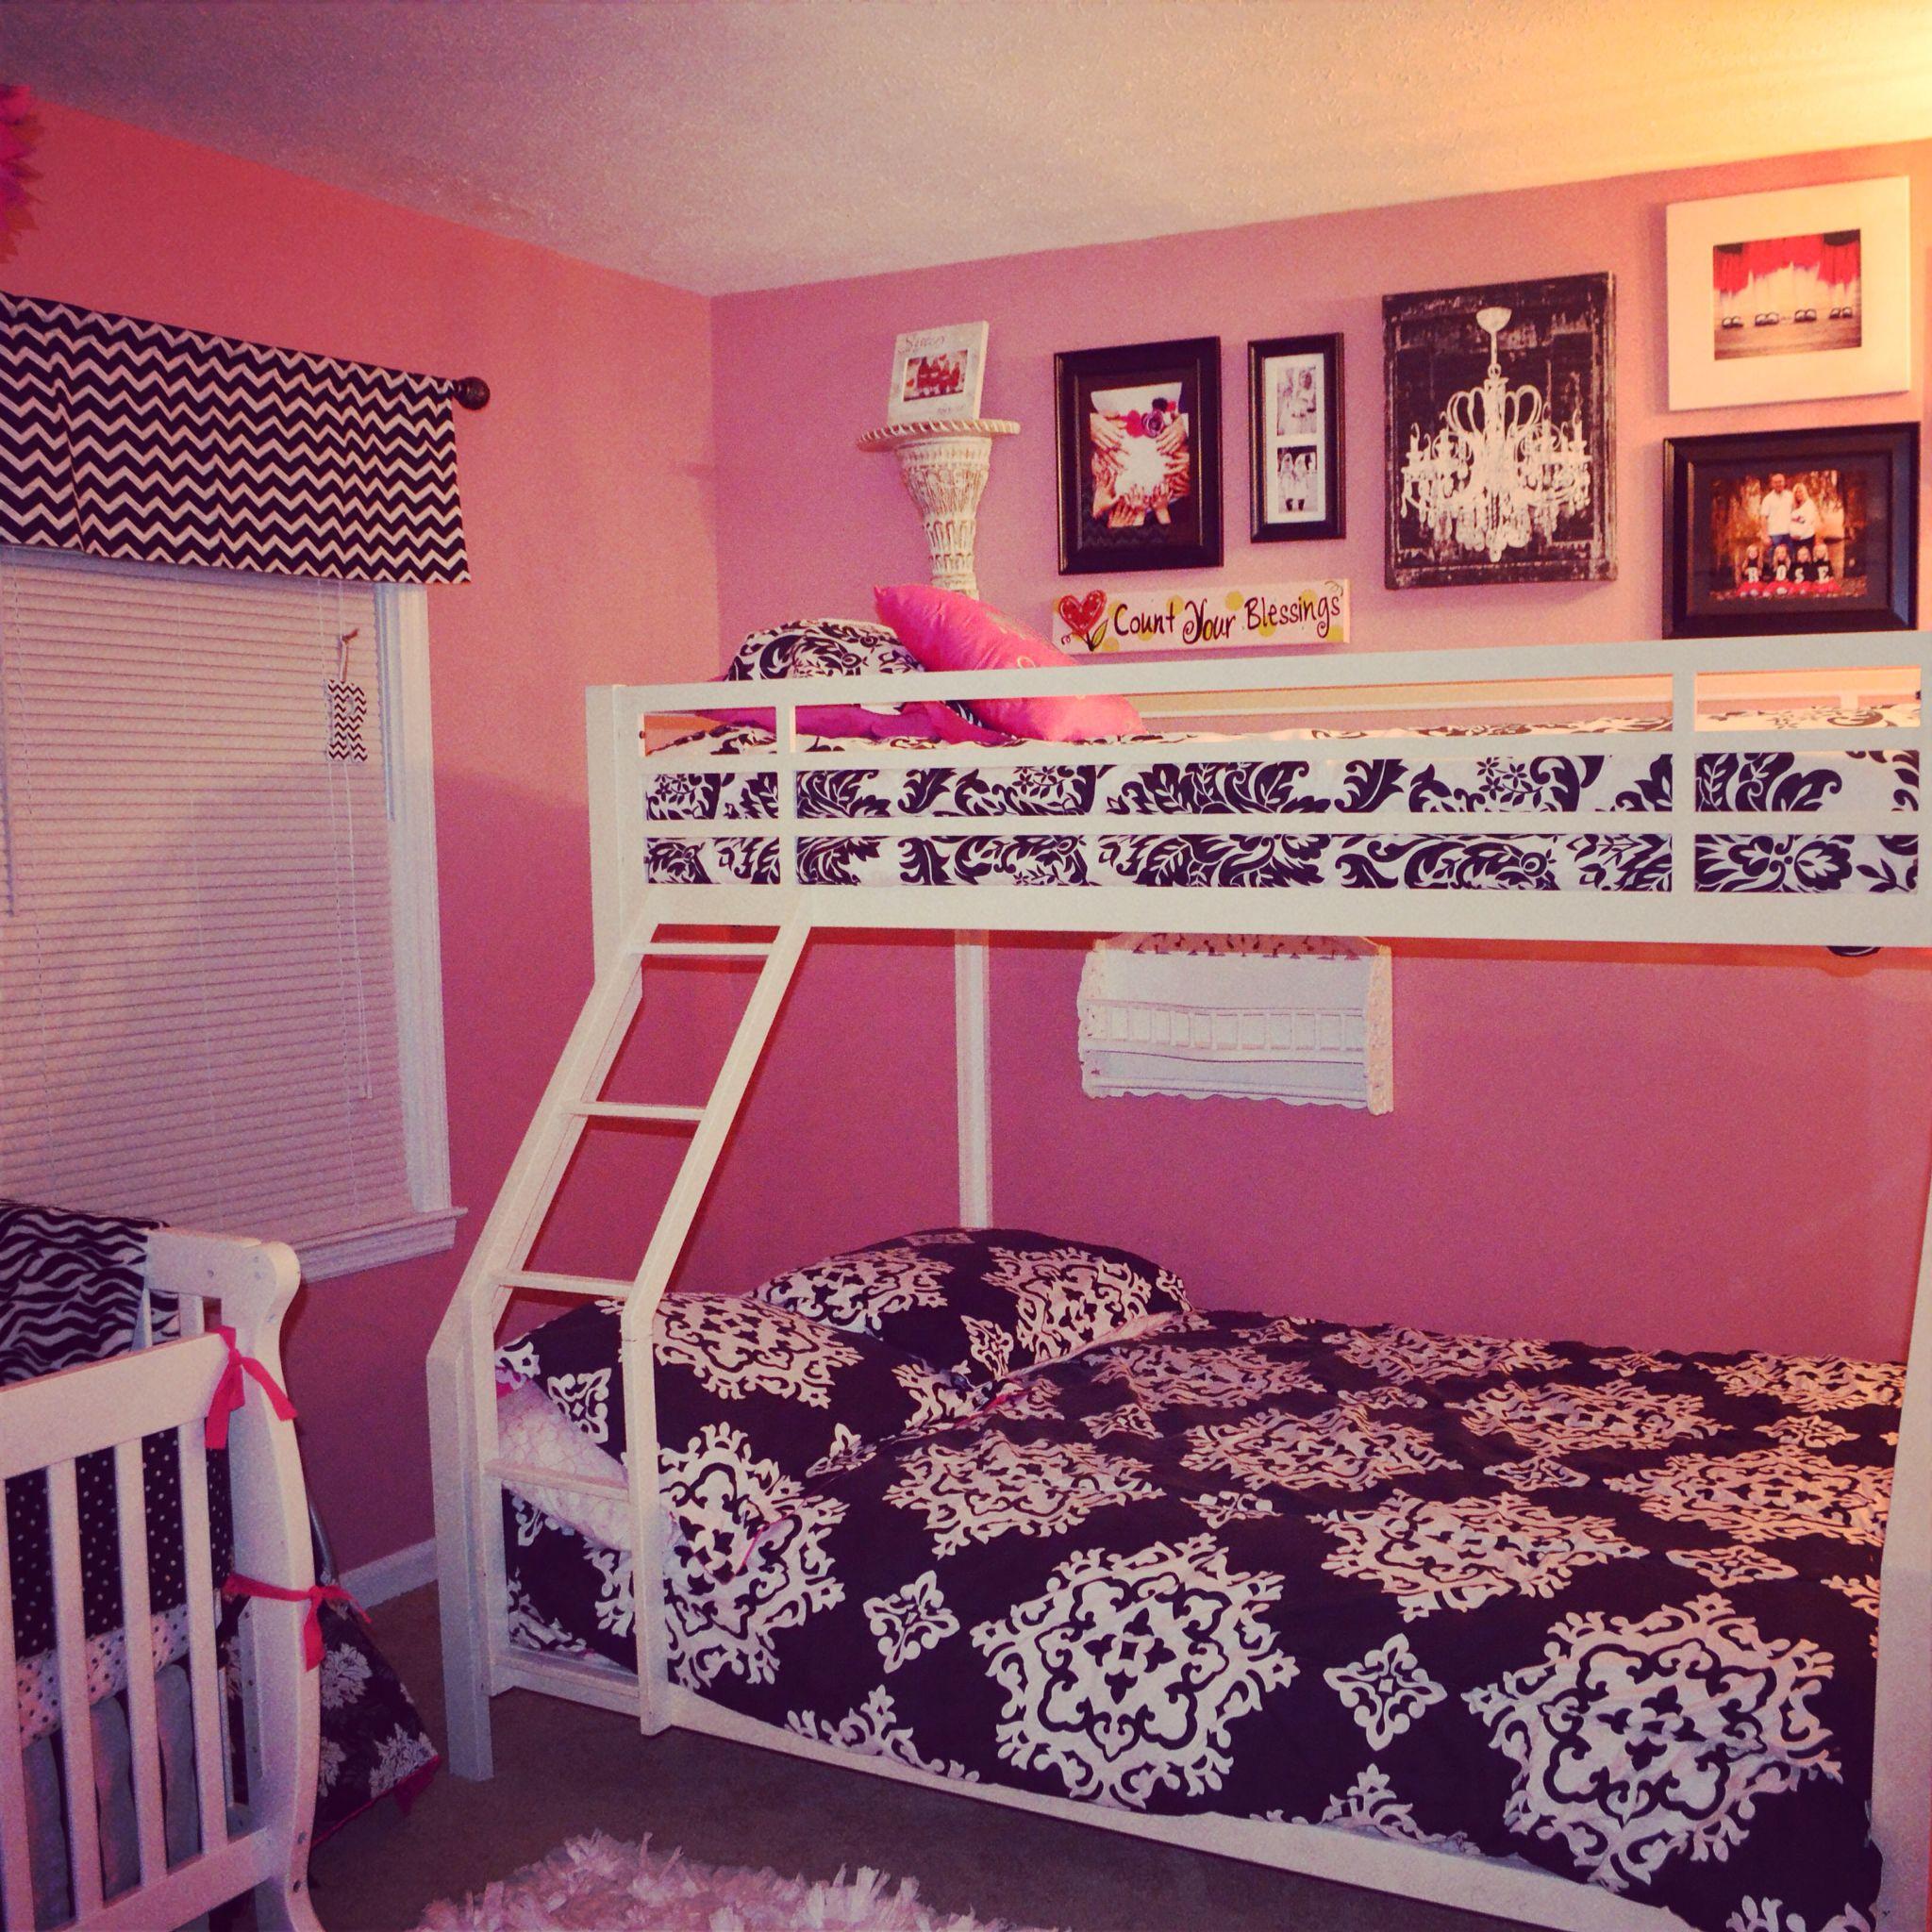 Black, White U0026 Pink, Damask U0026 Polka Dot Shared Nursery / Bedroom For Baby.  Girls Bedroom DecoratingGirl Bedroom DesignsBedroom Ideas10 Year Old ...